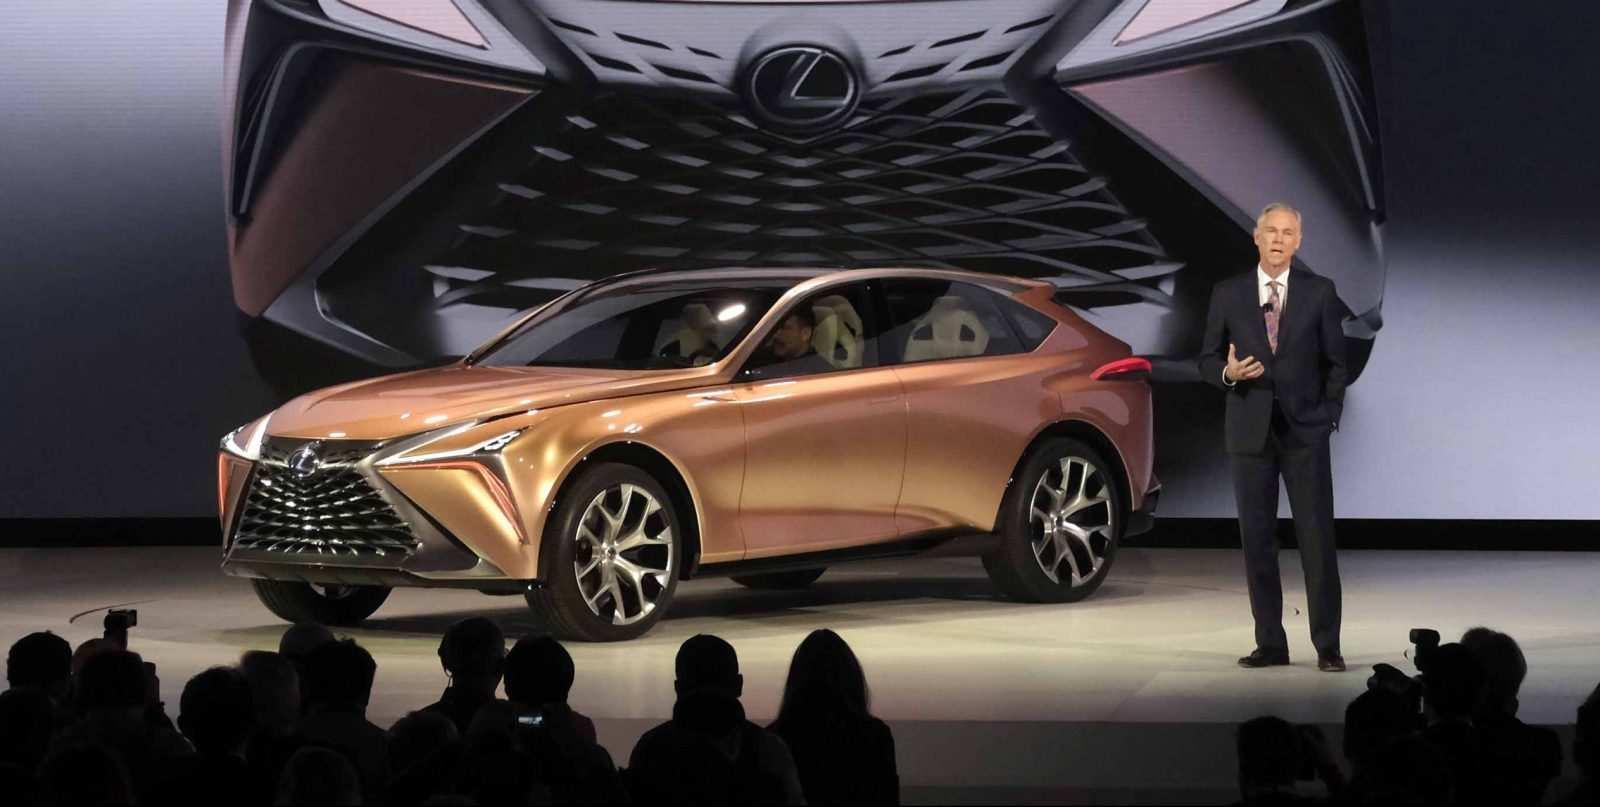 47 Great Lexus Plug In Hybrid 2020 Review with Lexus Plug In Hybrid 2020